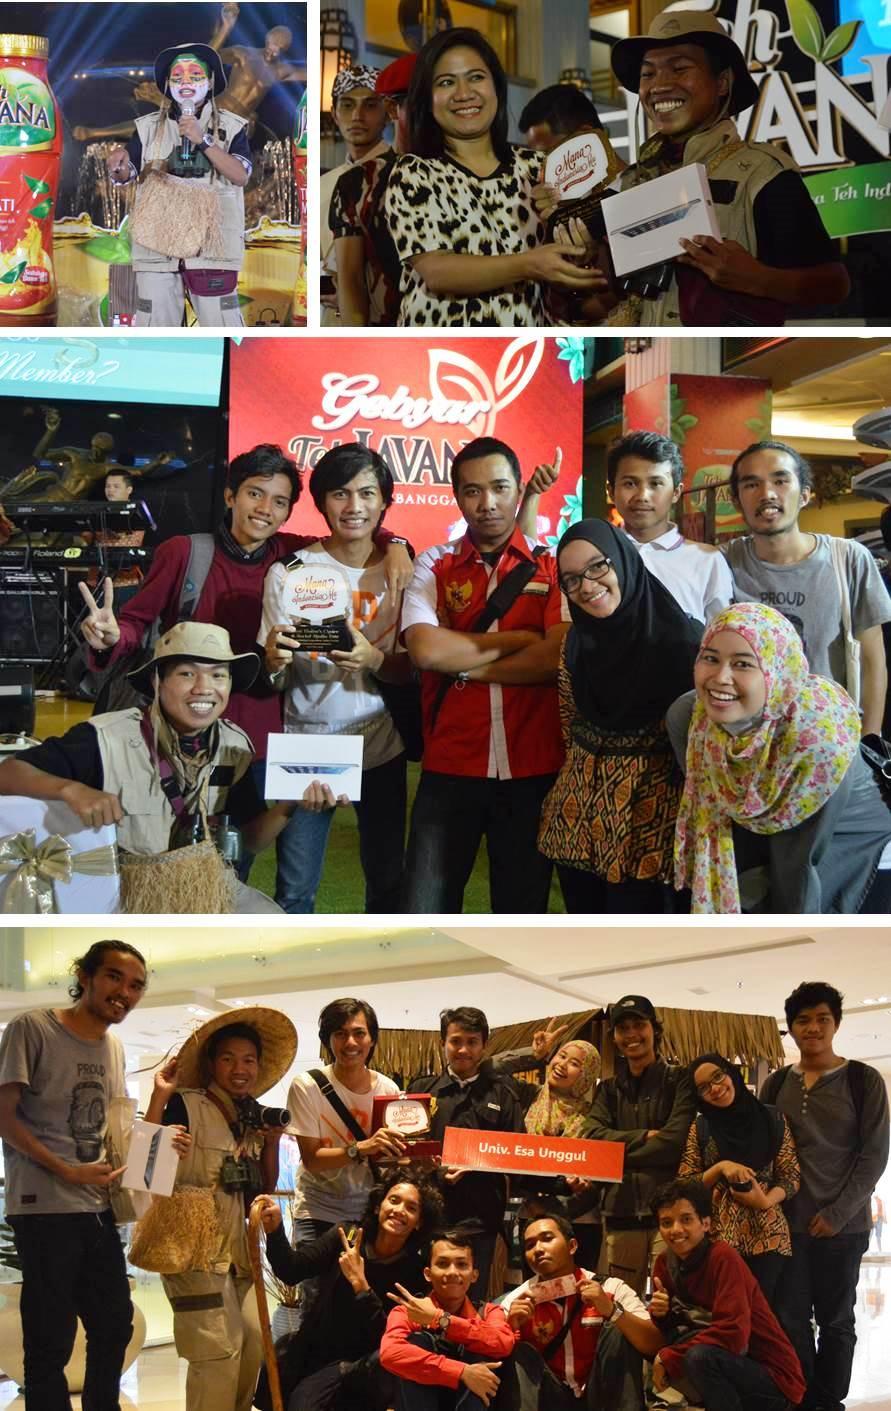 Tim Mahasiswa FIKOM Universitas Esa Unggul Menang Kategori Best Visitor's Choice and Social Media Voting dan Runner Up Best Content Lomba Mading Jurnalistik Mana IndonesiaMu 2015